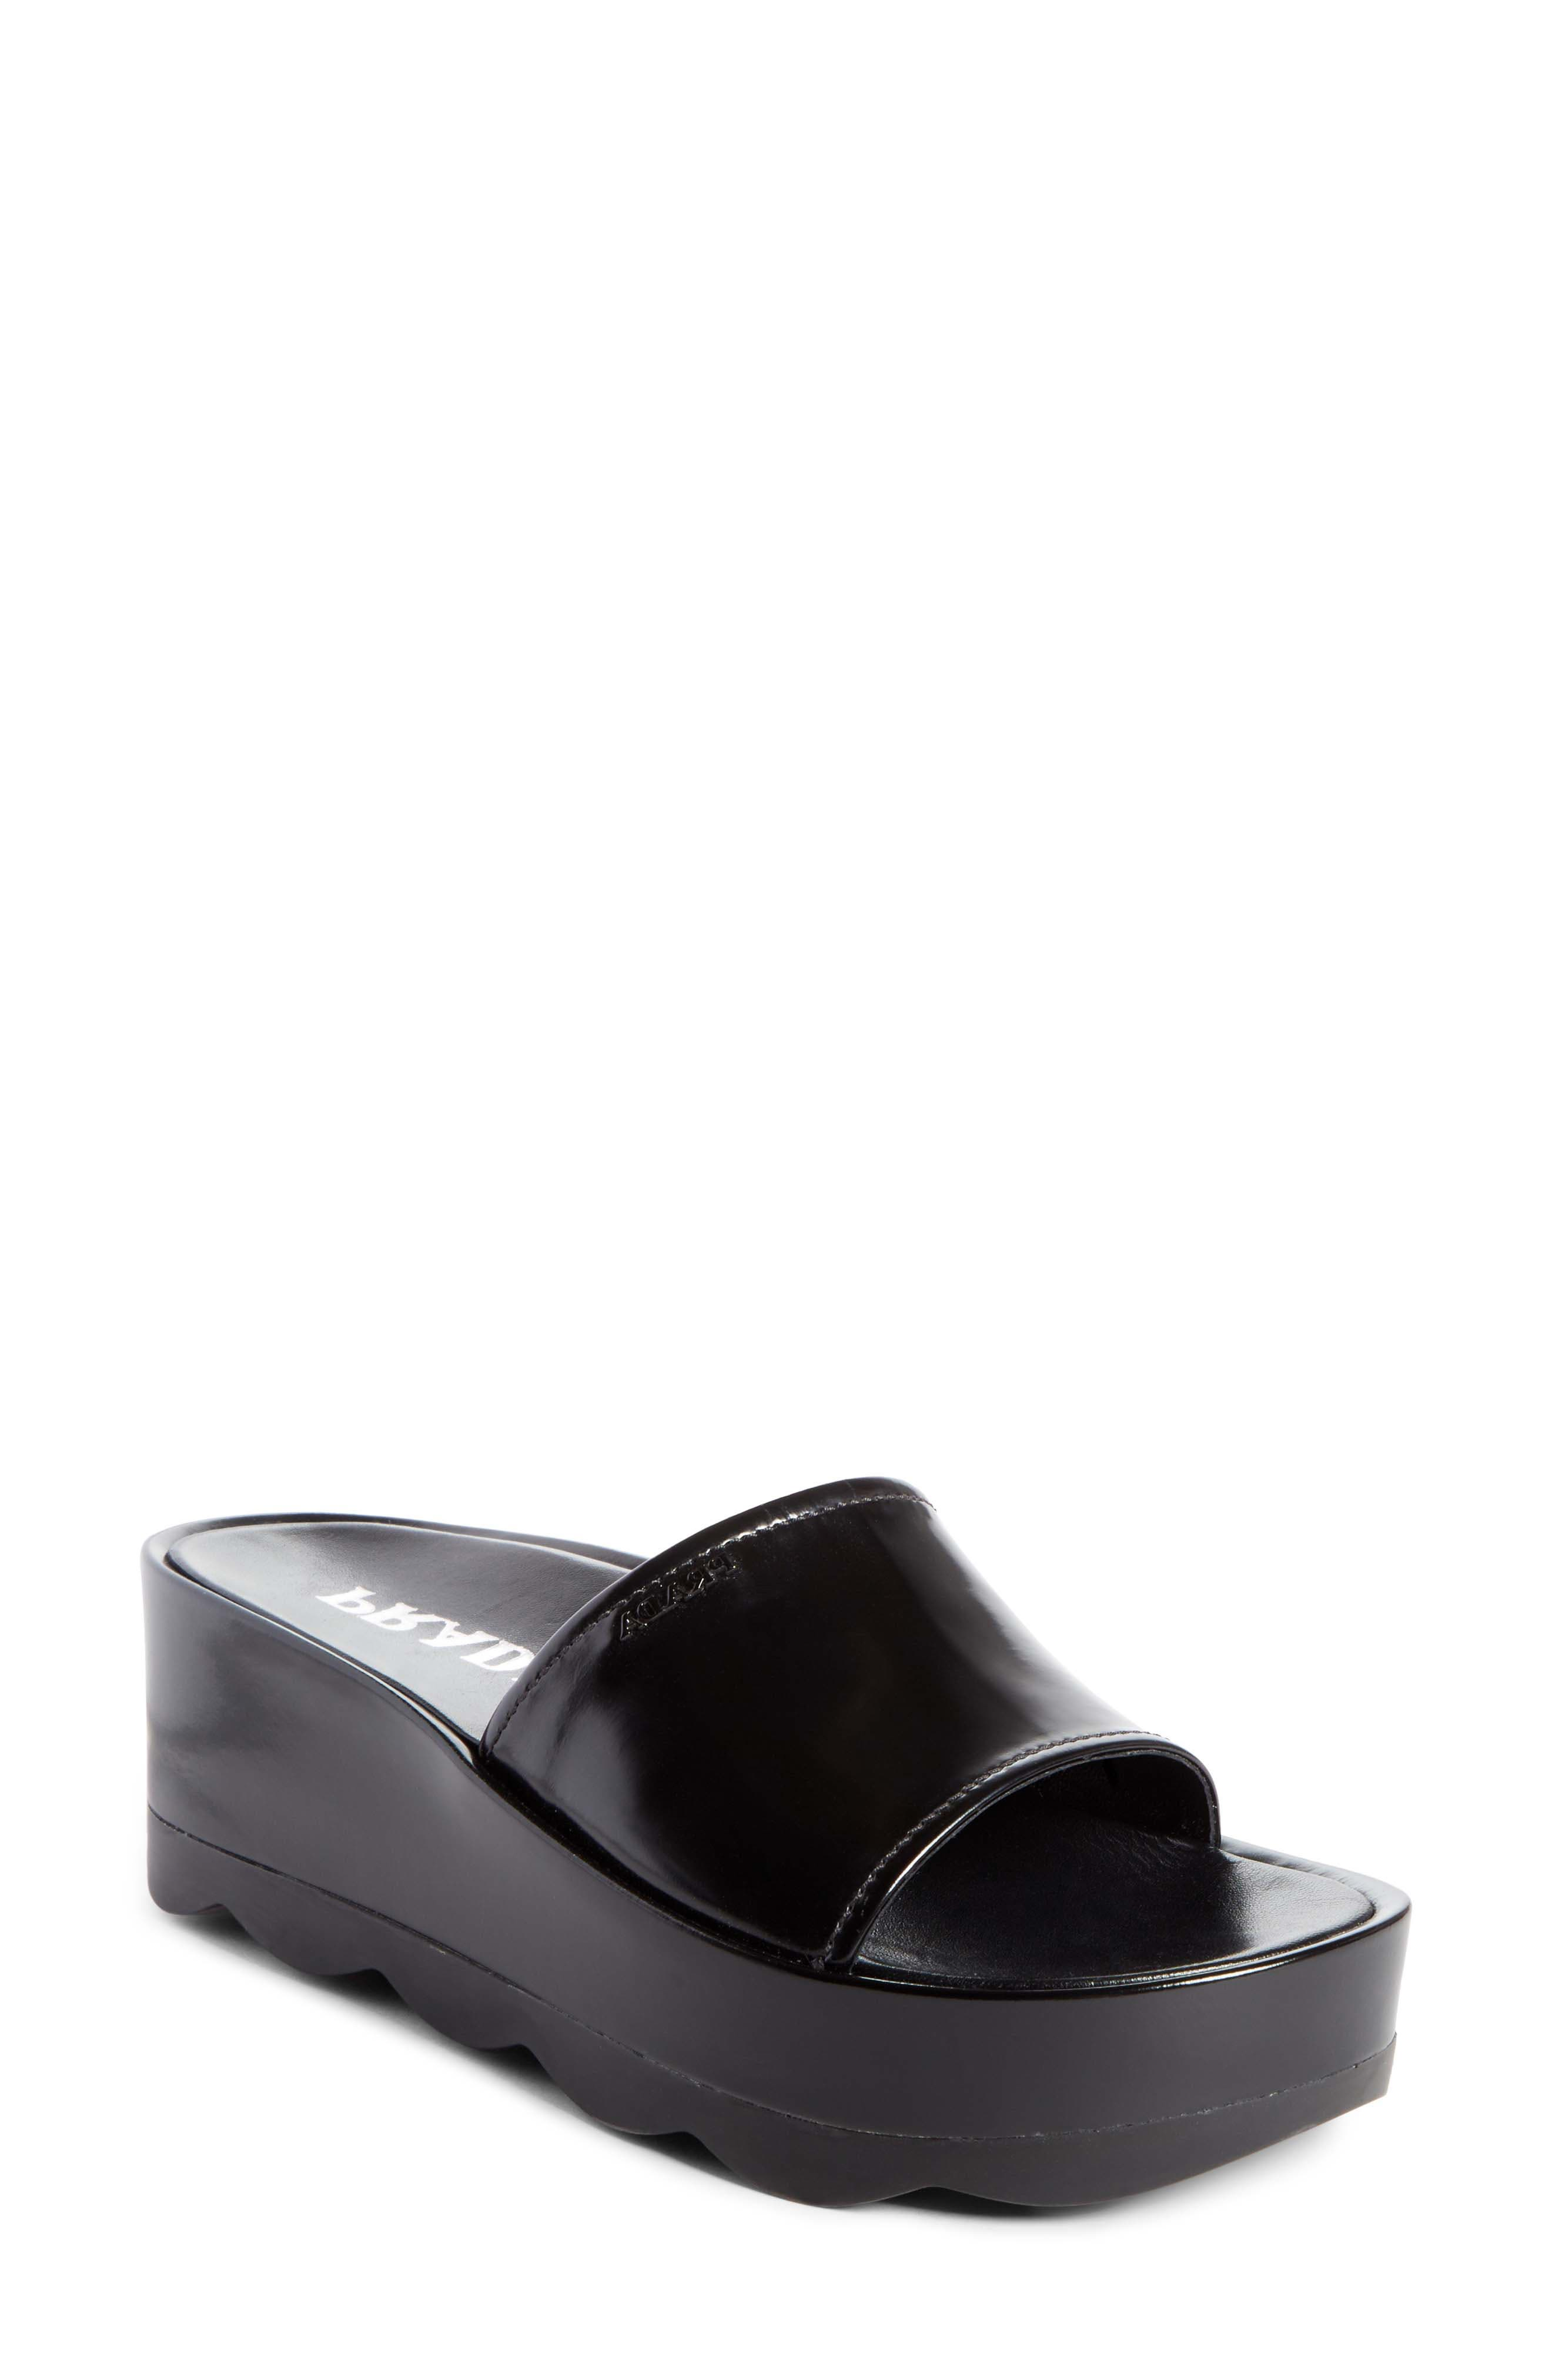 Platform Slide Sandal,                             Main thumbnail 1, color,                             001